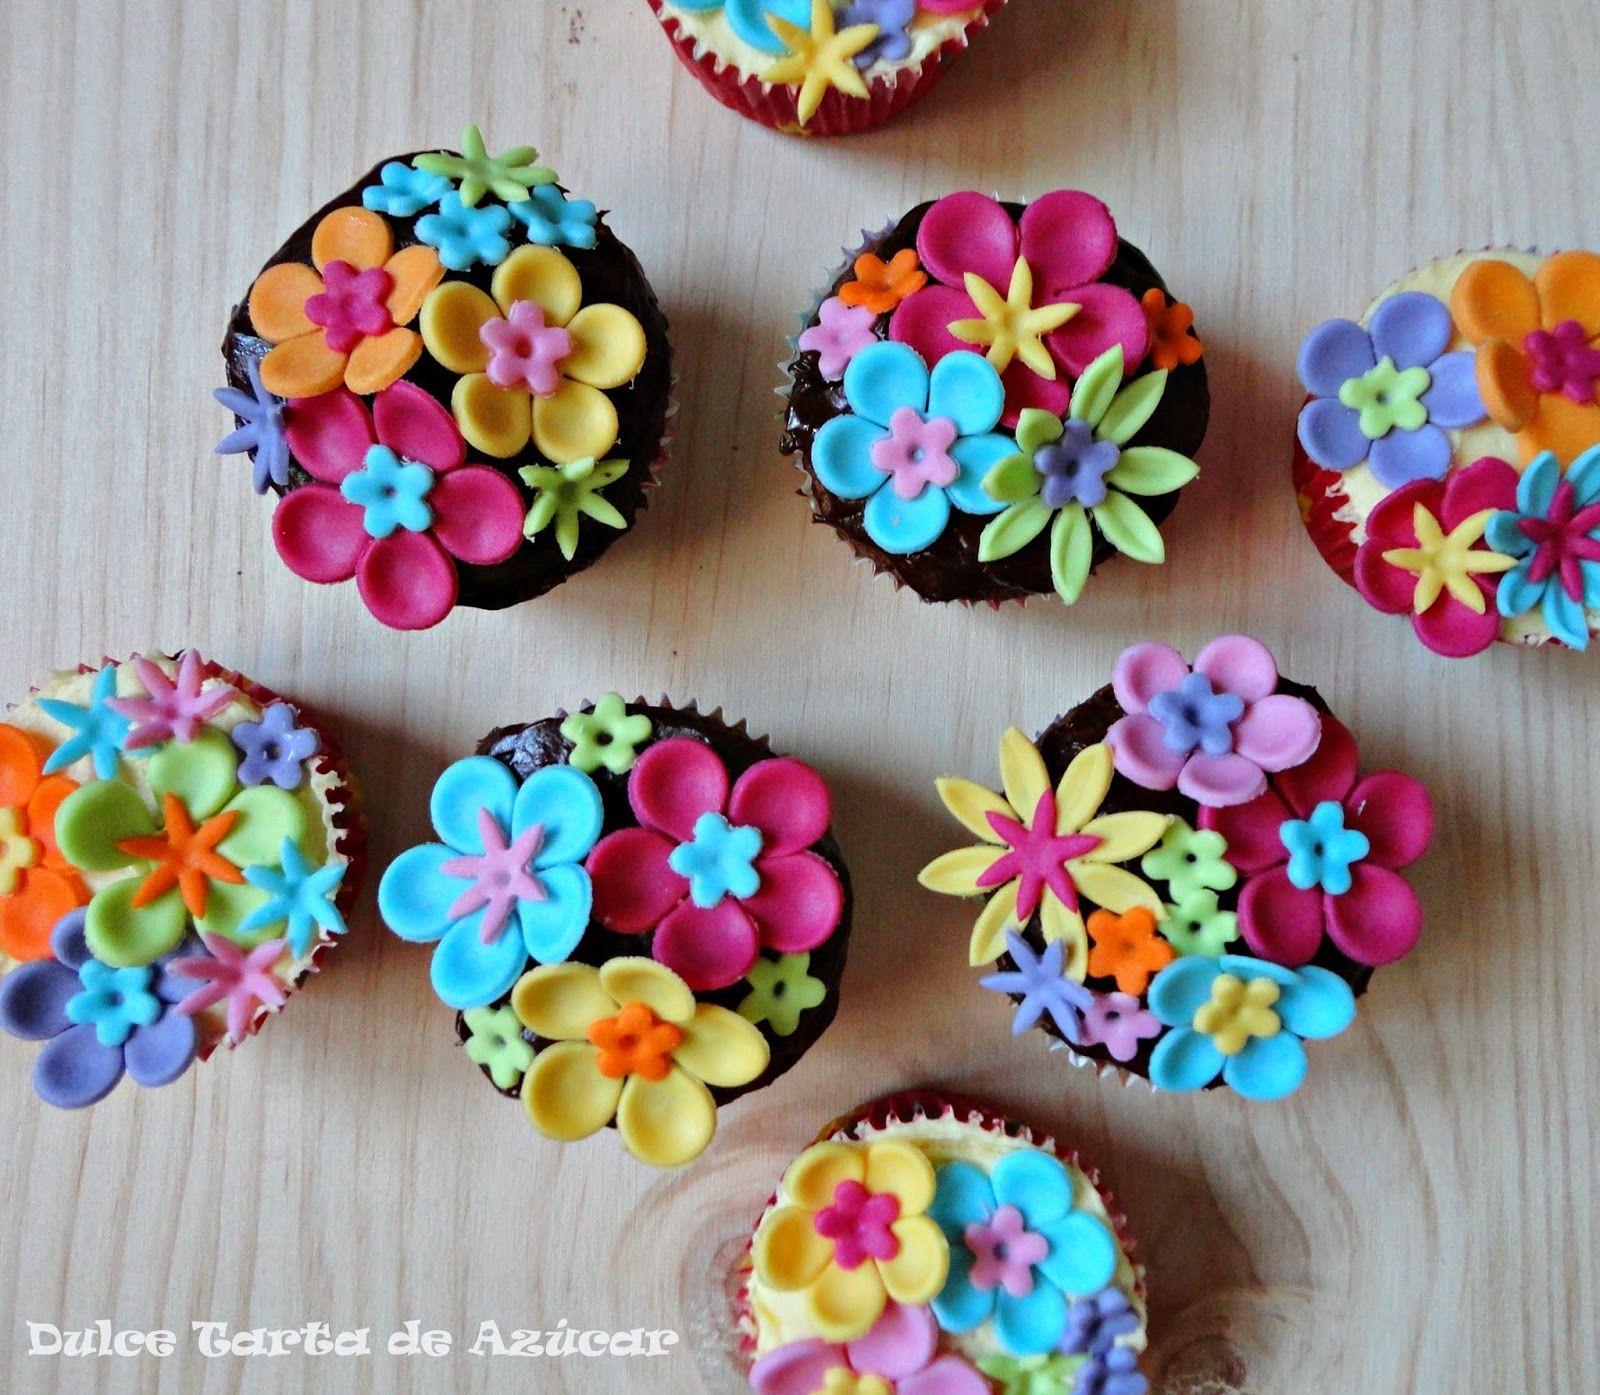 cupcakes de chocolate y lim n decorados con flores de fondant cakes pinterest cup cakes. Black Bedroom Furniture Sets. Home Design Ideas